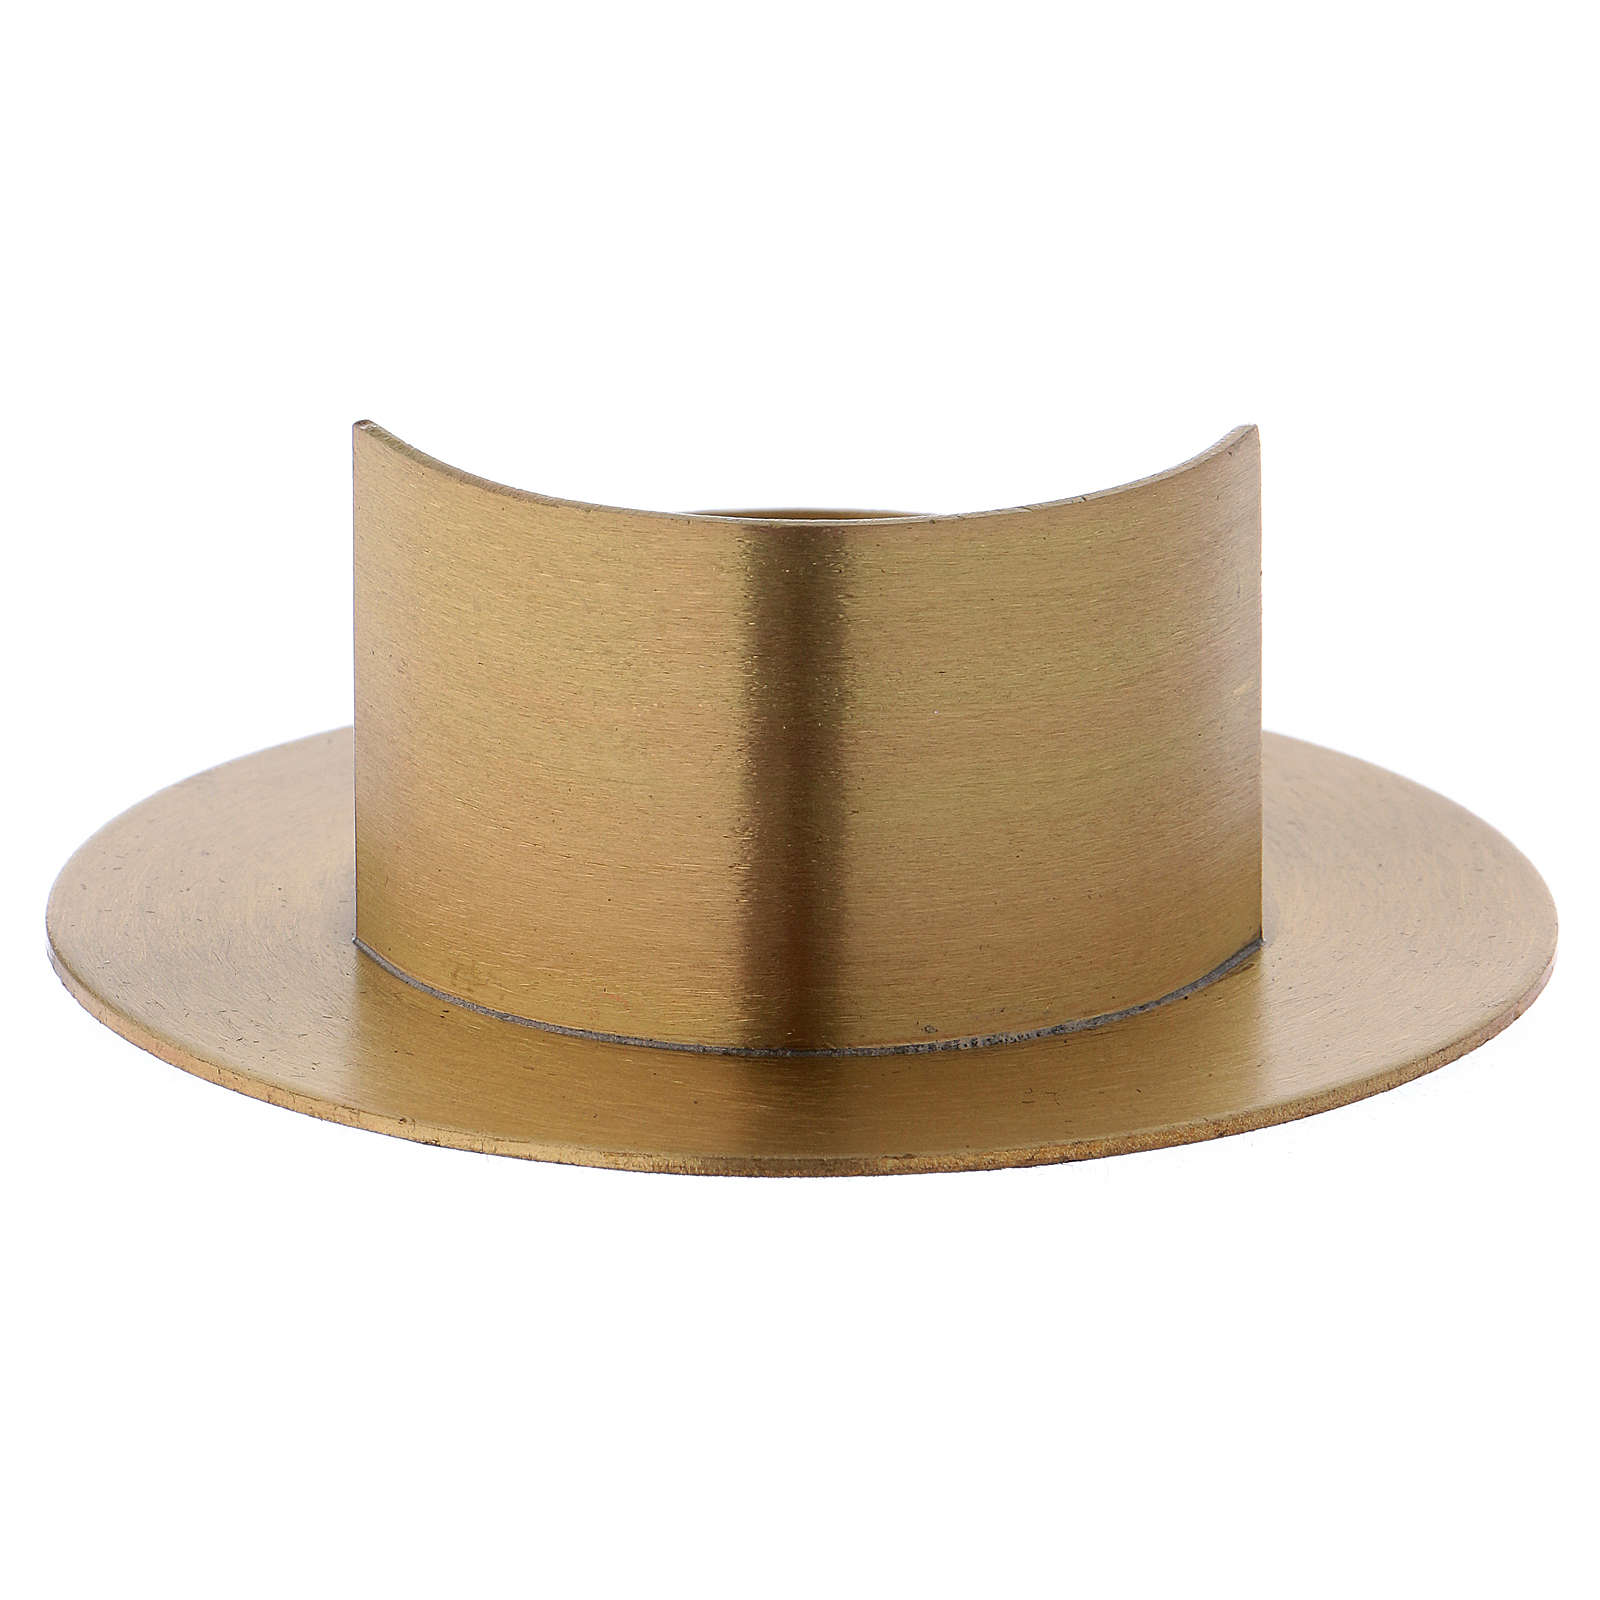 Portacandele ottone dorato satinato moderno diam. 5 cm 4